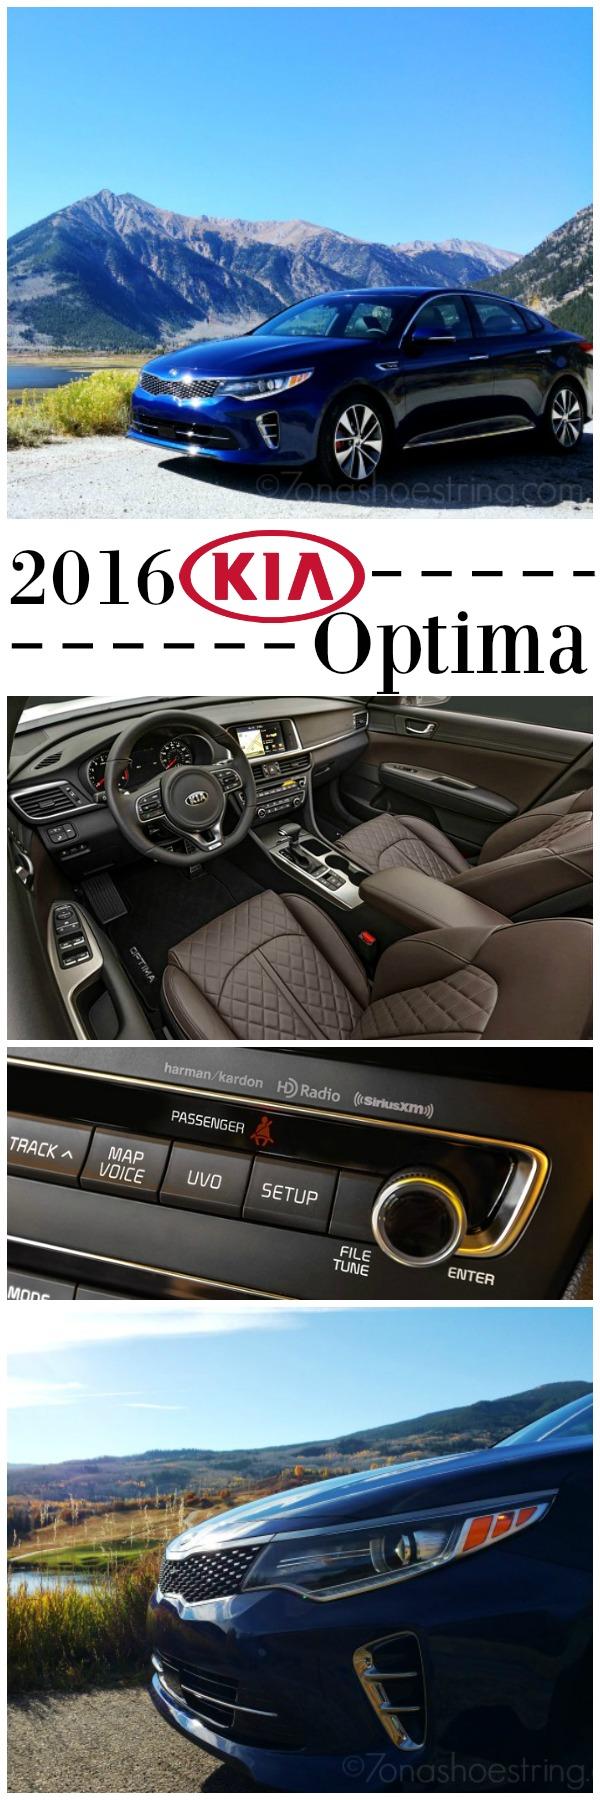 2016 Kia Optima exterior and interior pictures